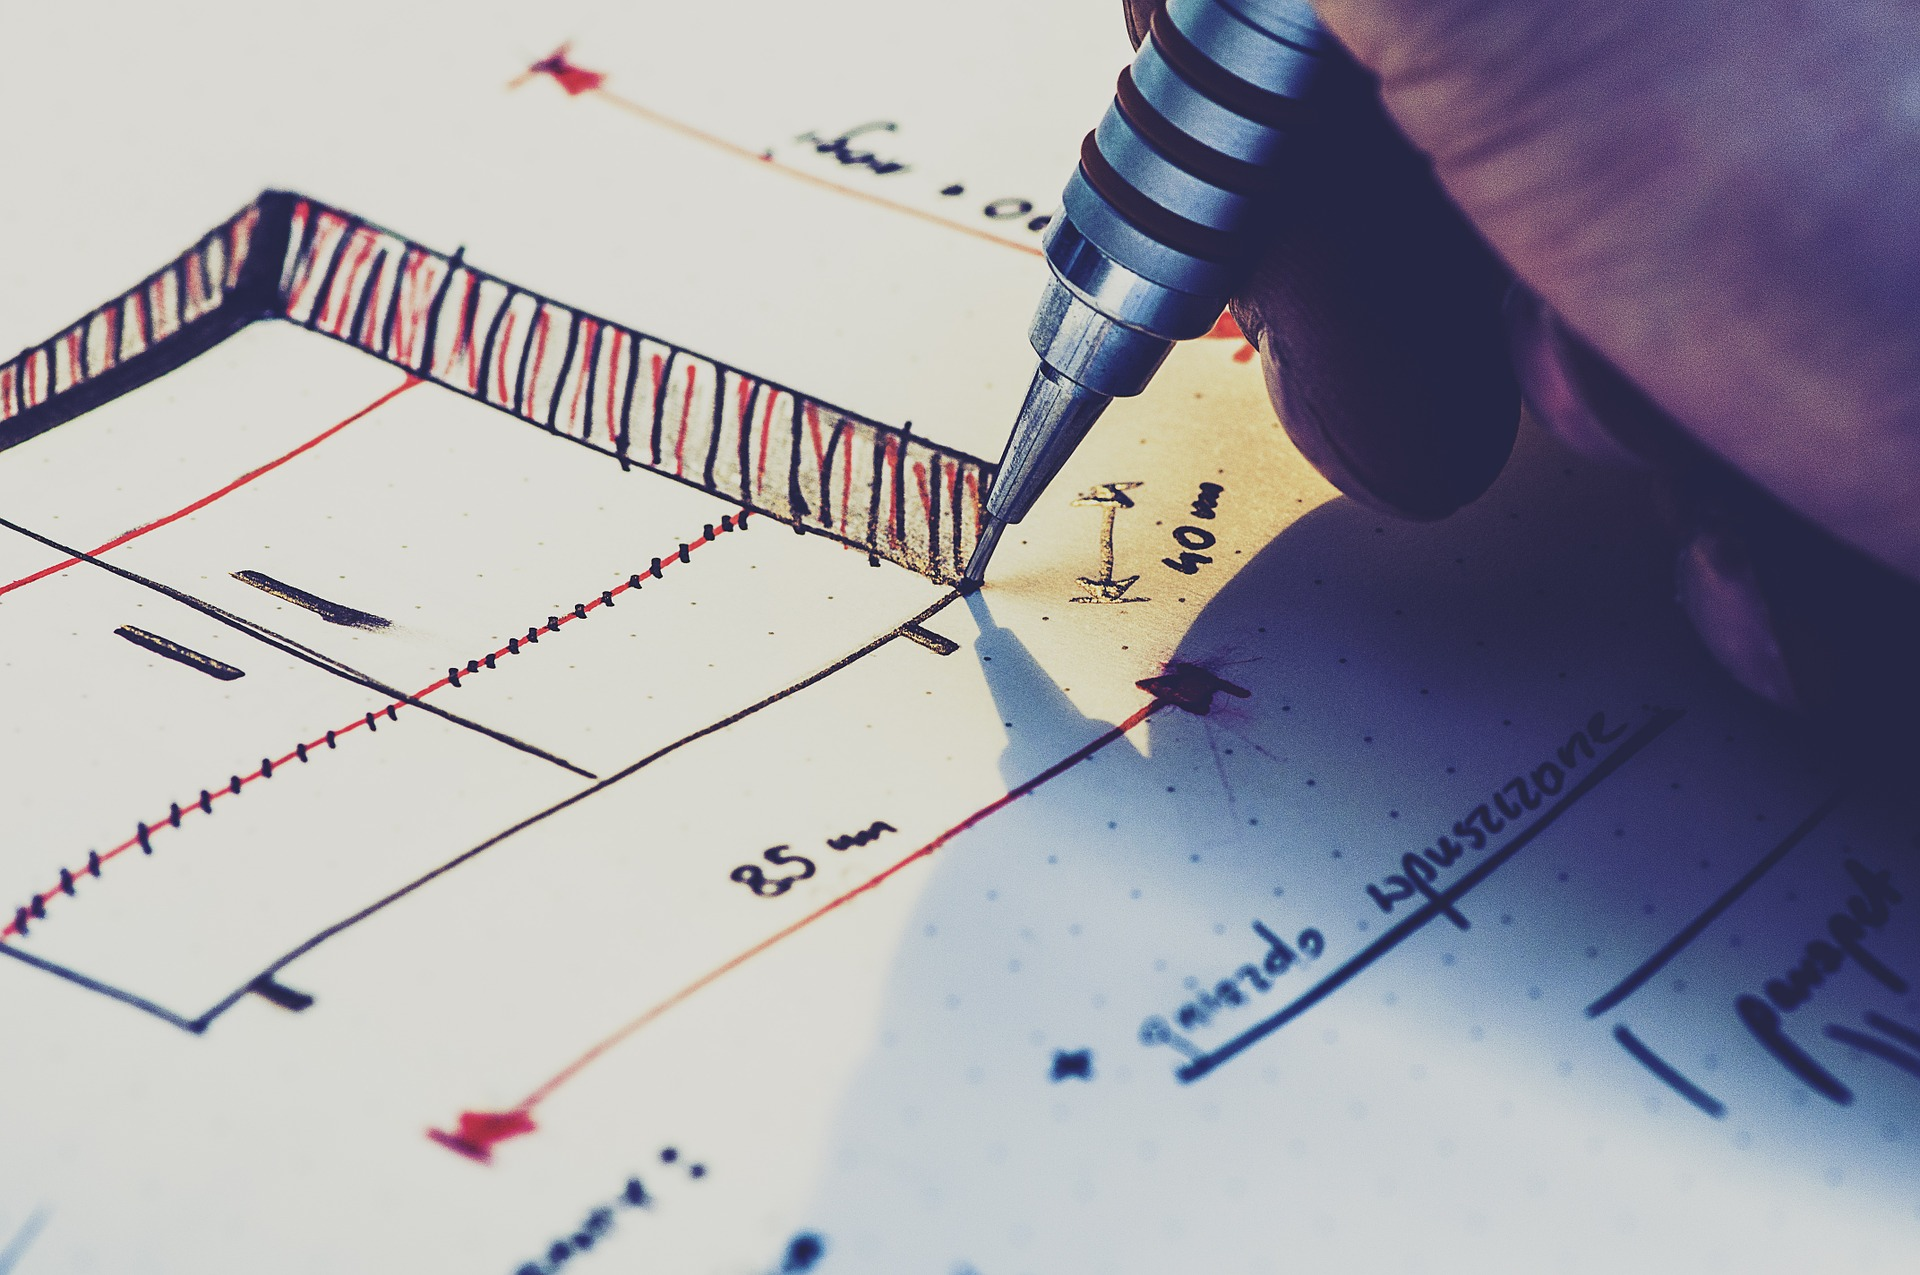 Design Thinking Drawing Hand